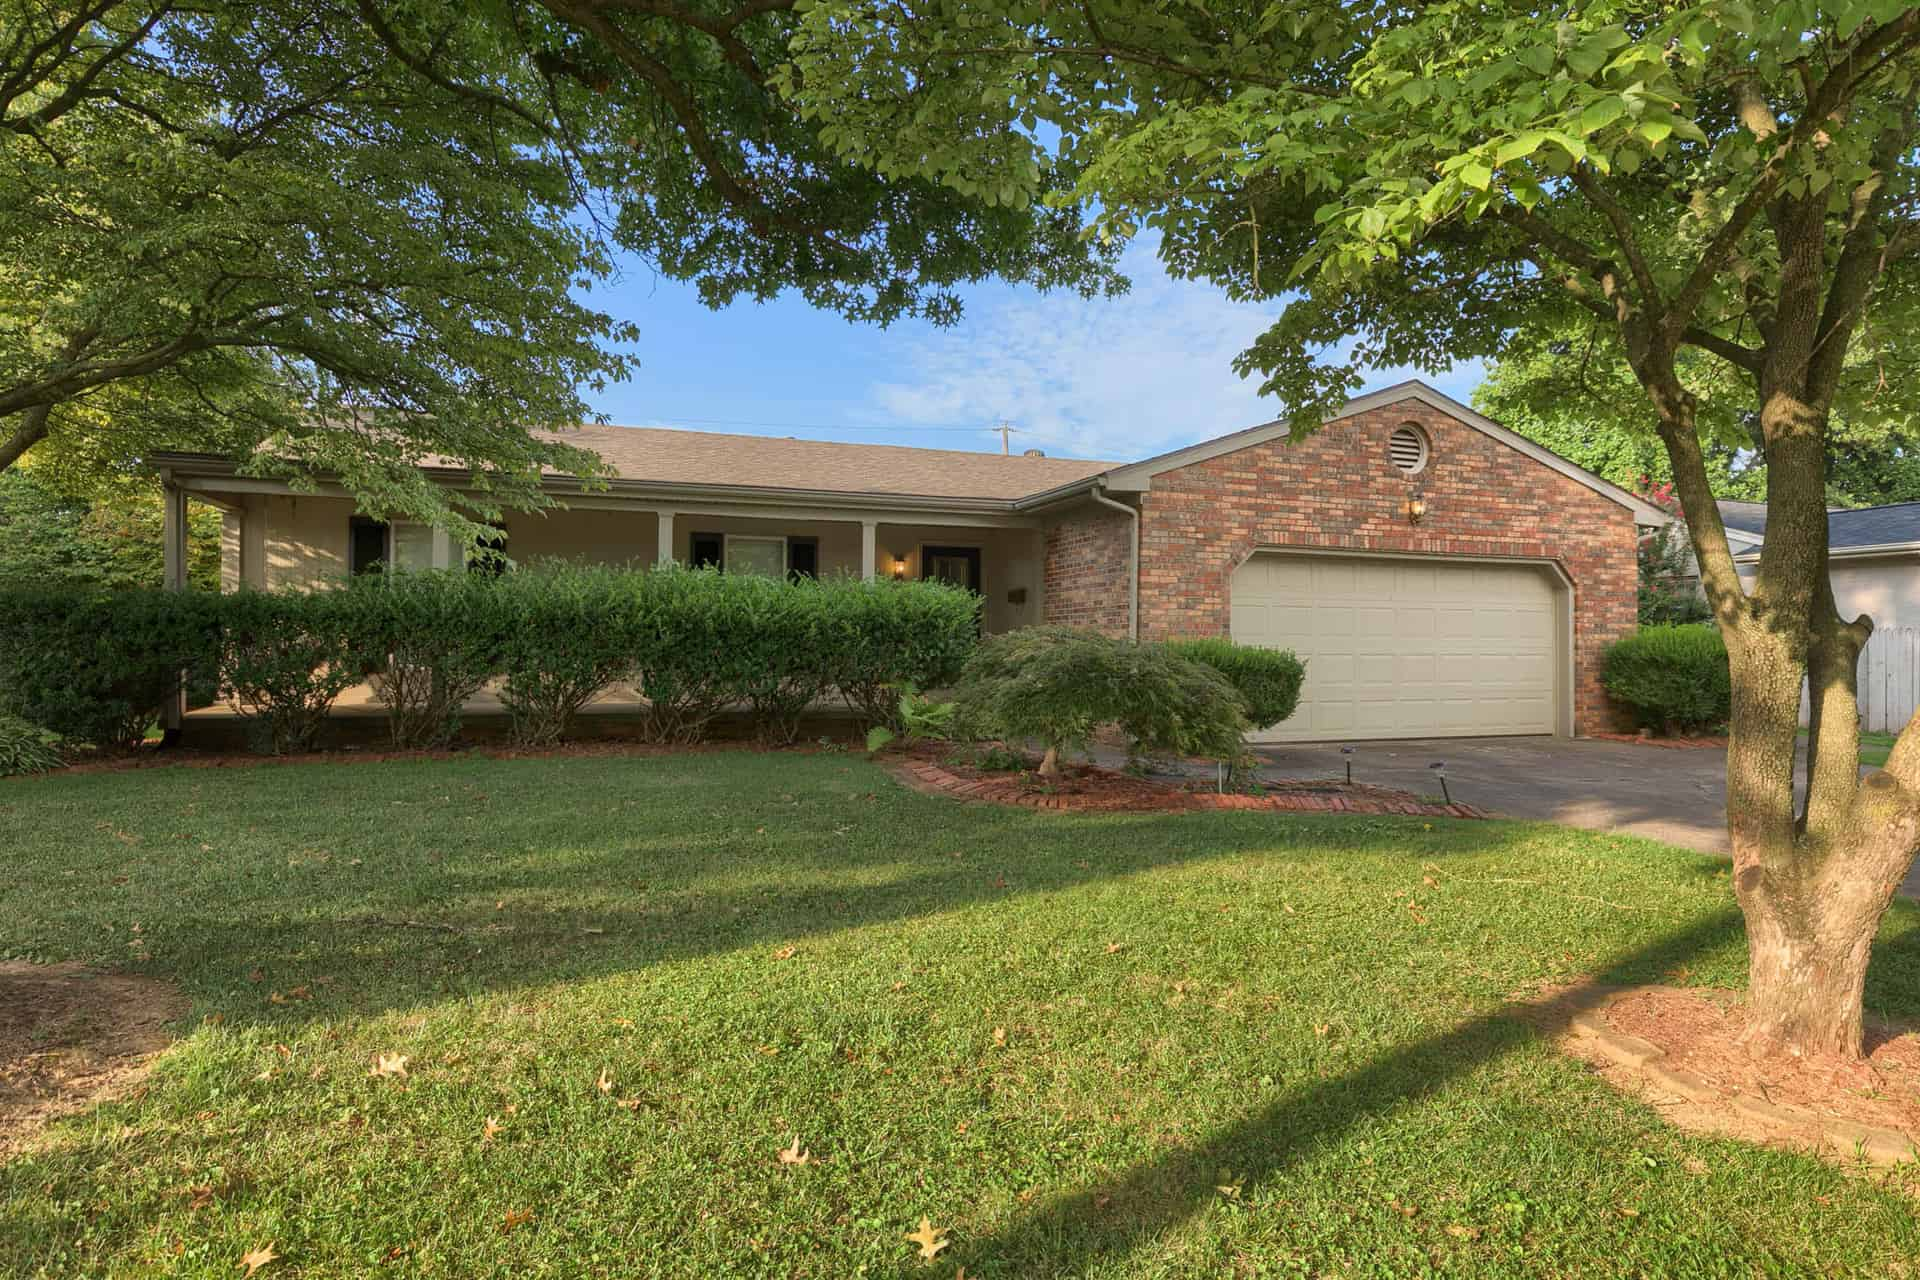 1518 Springdale Dr., Owensboro, KY 42301